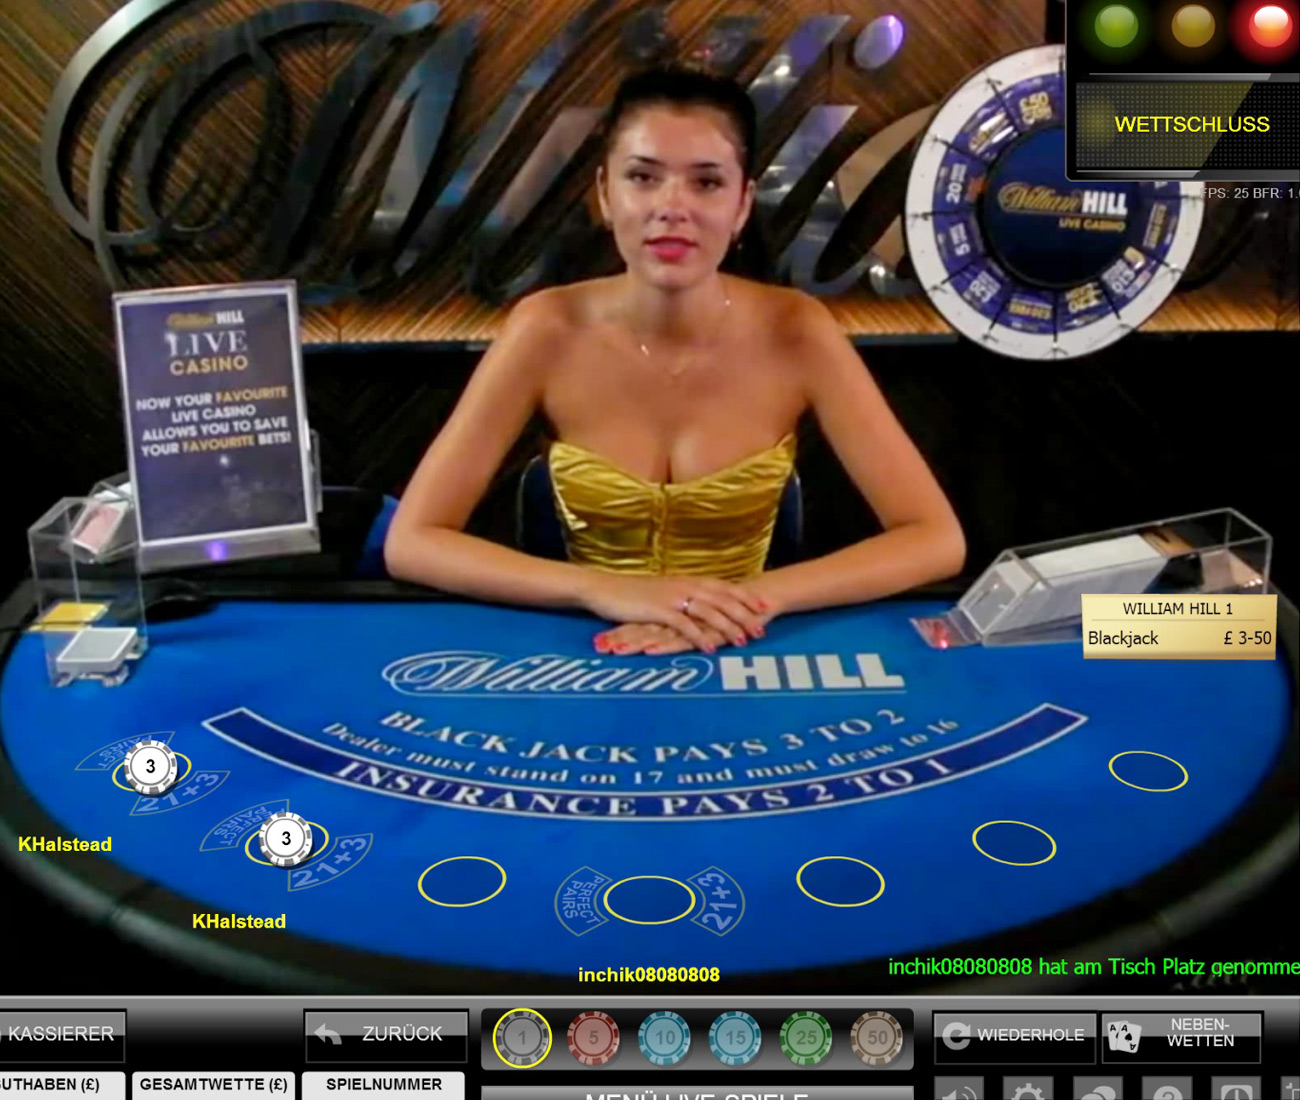 William Hill Live Casino Blackjack